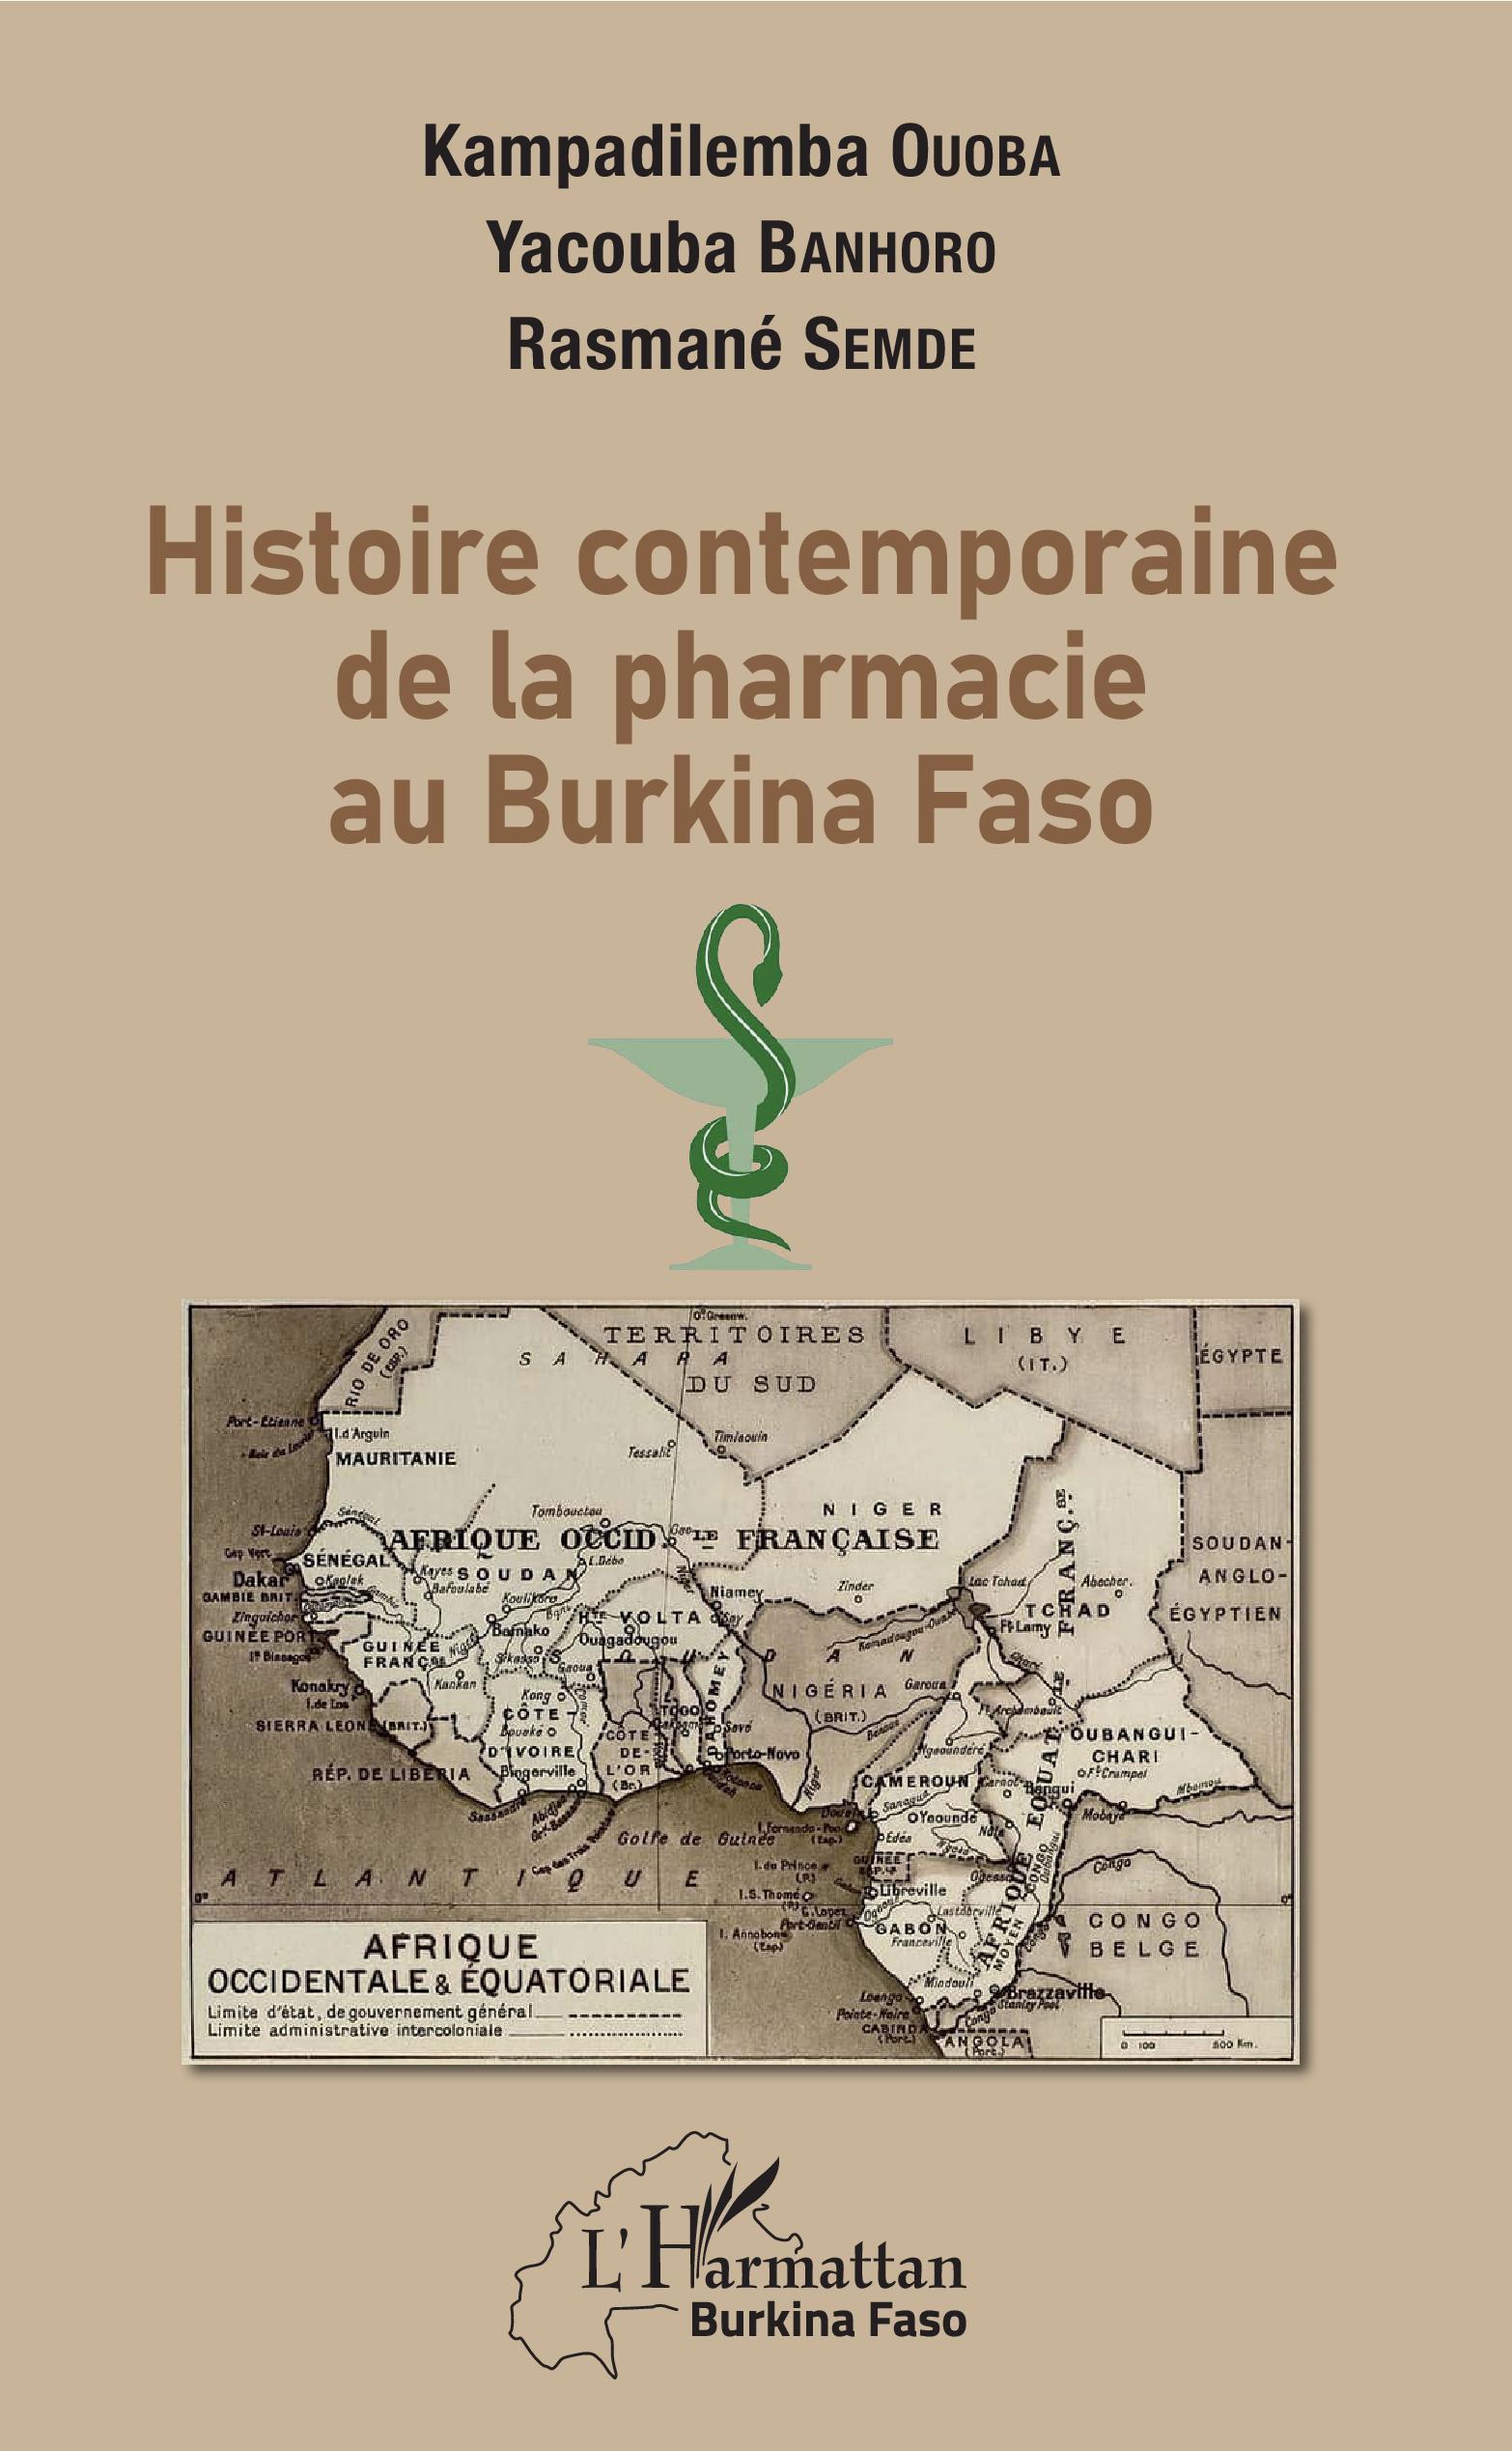 HISTOIRE CONTEMPORAINE DE LA PHARMACIE AU BURKINA FASO